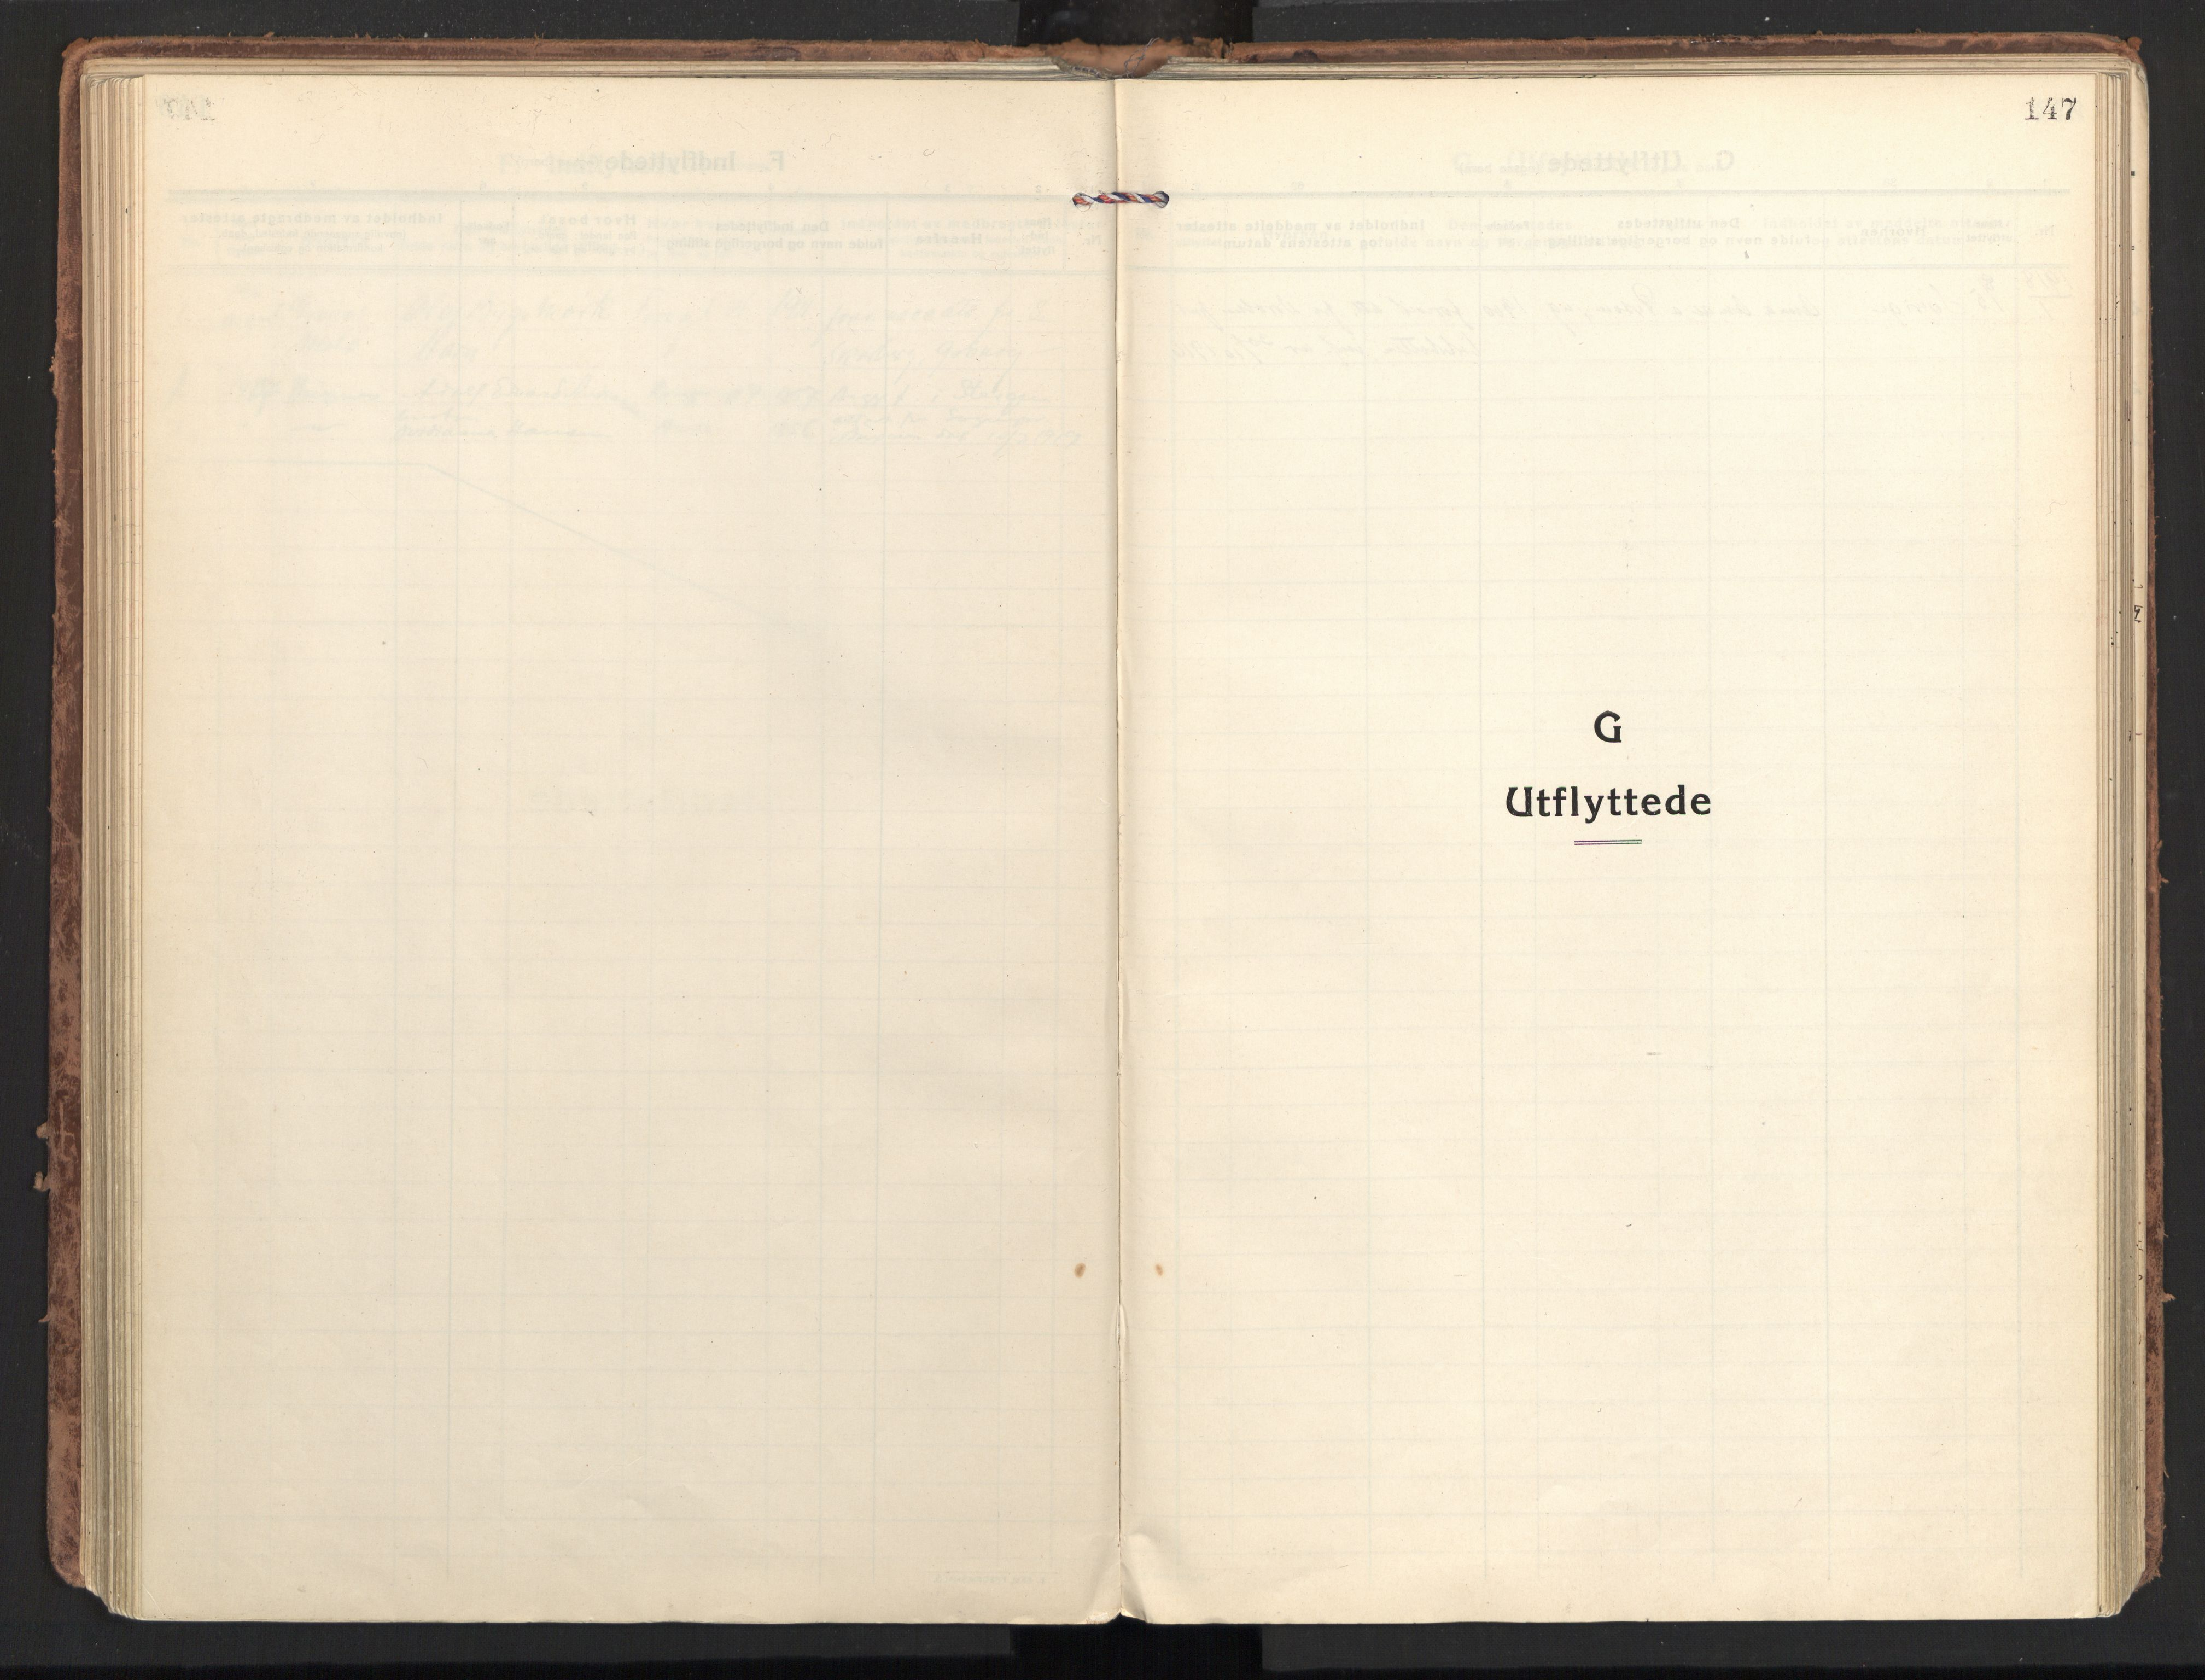 SAT, Ministerialprotokoller, klokkerbøker og fødselsregistre - Nordland, 801/L0018: Ministerialbok nr. 801A18, 1916-1930, s. 147